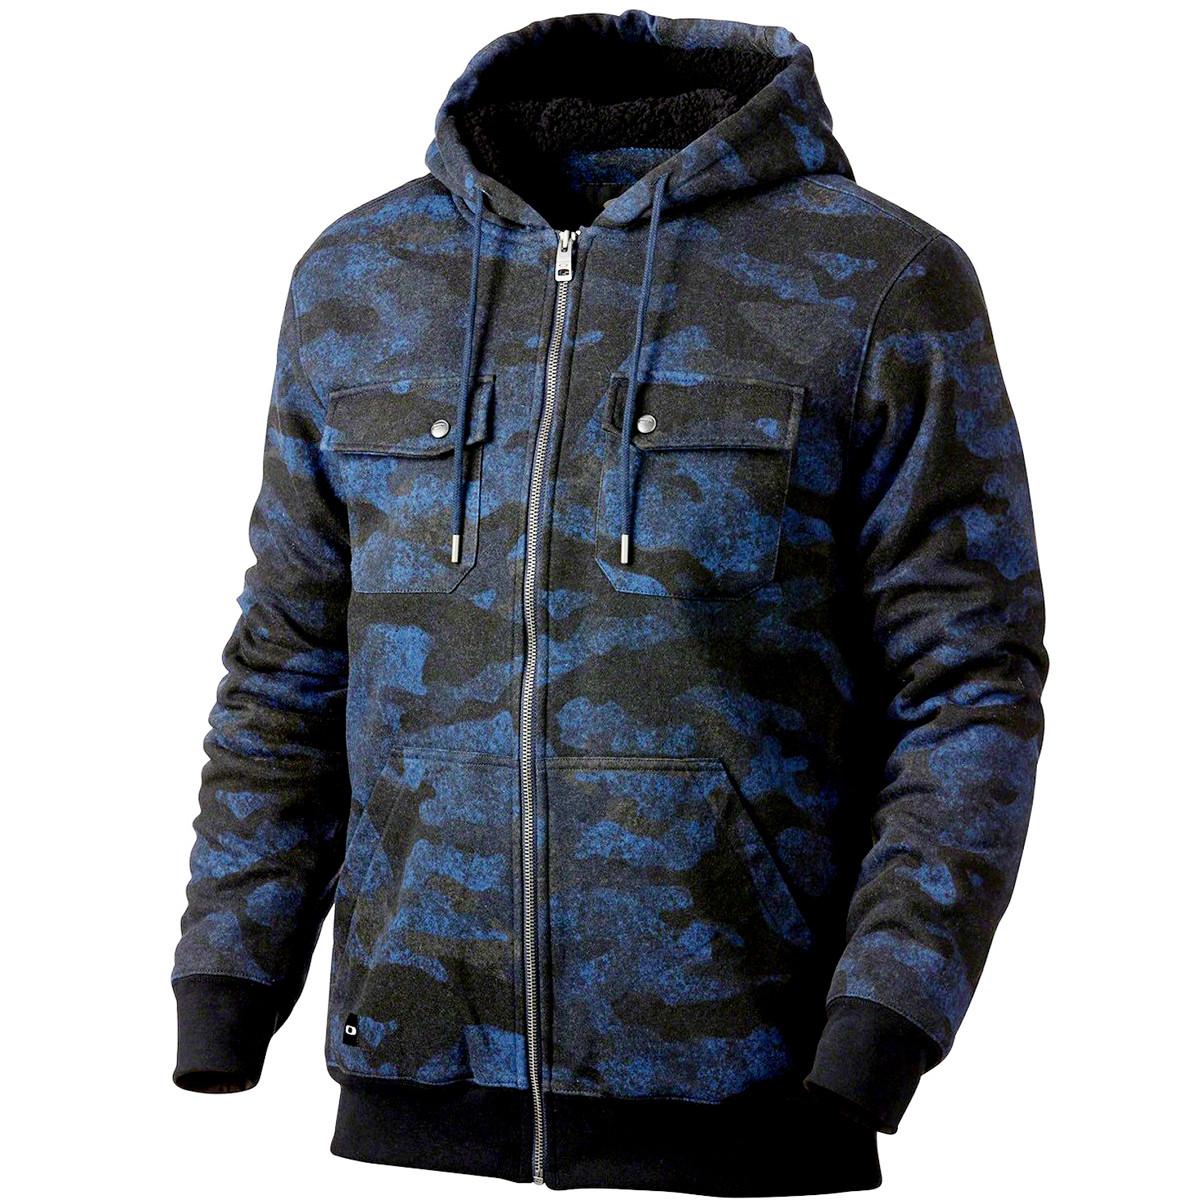 Moletom Oakley Agent Hoodie Camuflado Azul ref 472076-60B 999b5acea4